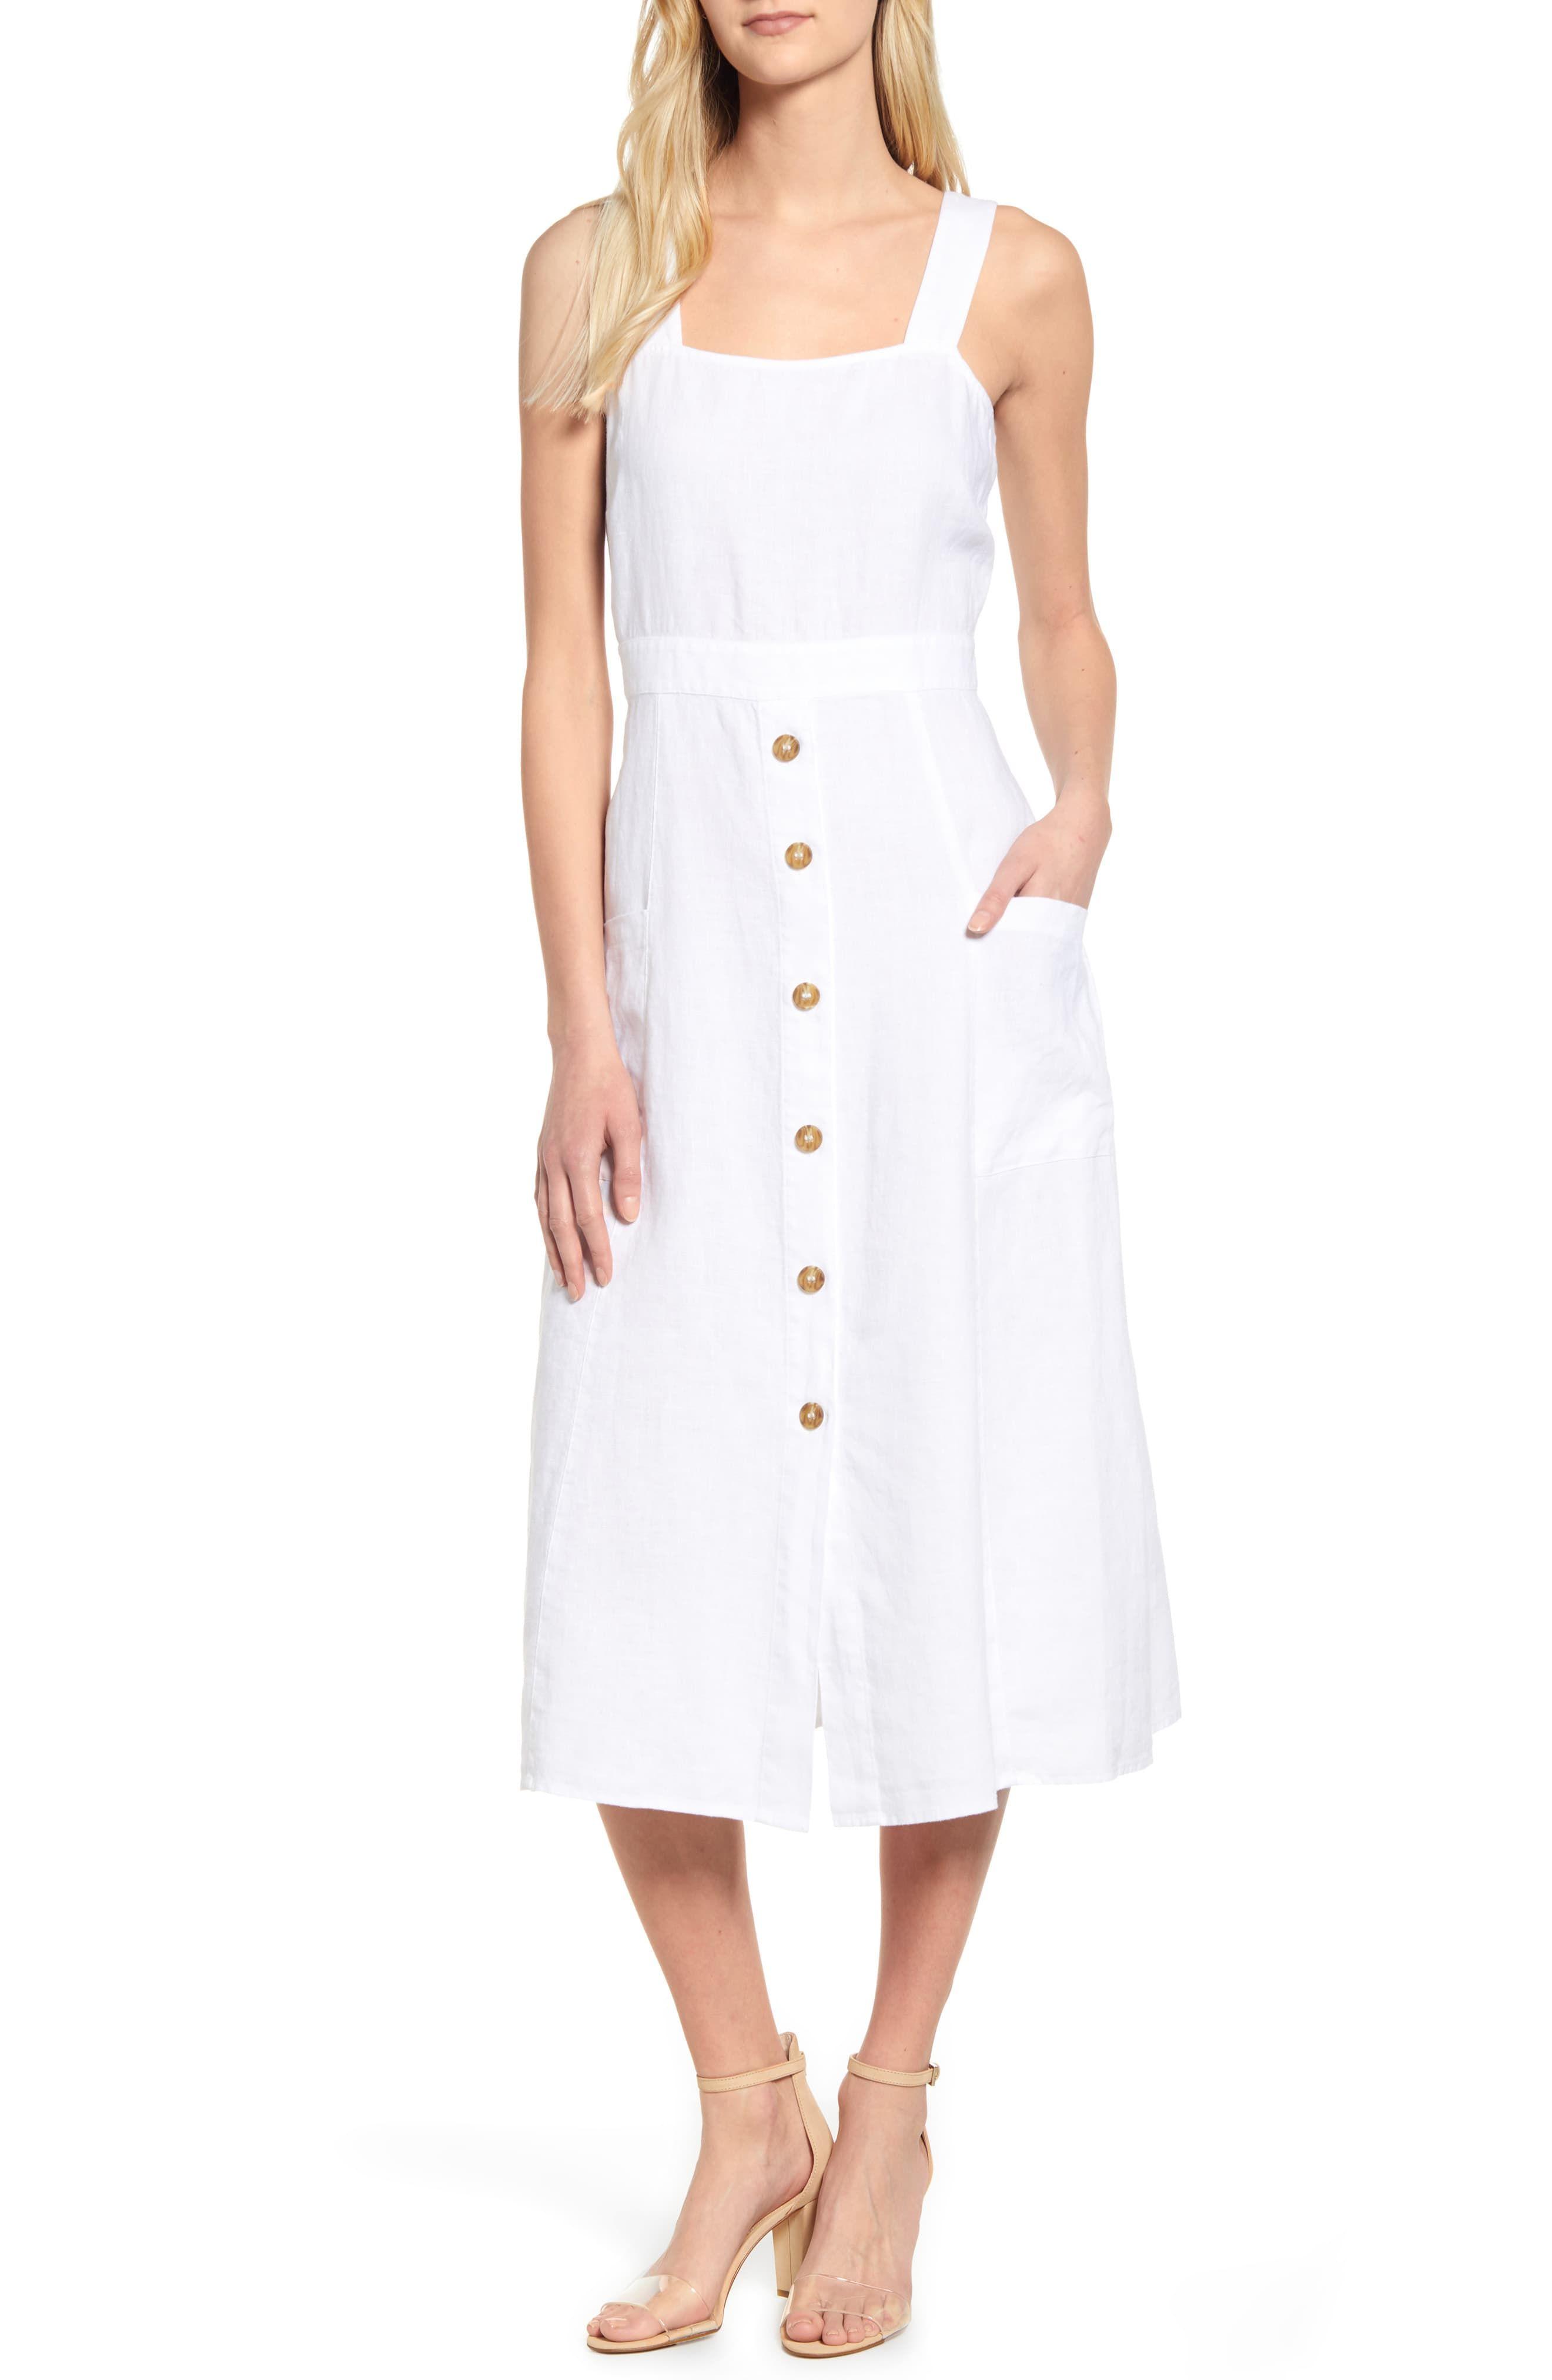 Vince Camuto A Line Linen Dress Nordstrom Dresses Nordstrom Dresses A Line Dress [ 4048 x 2640 Pixel ]